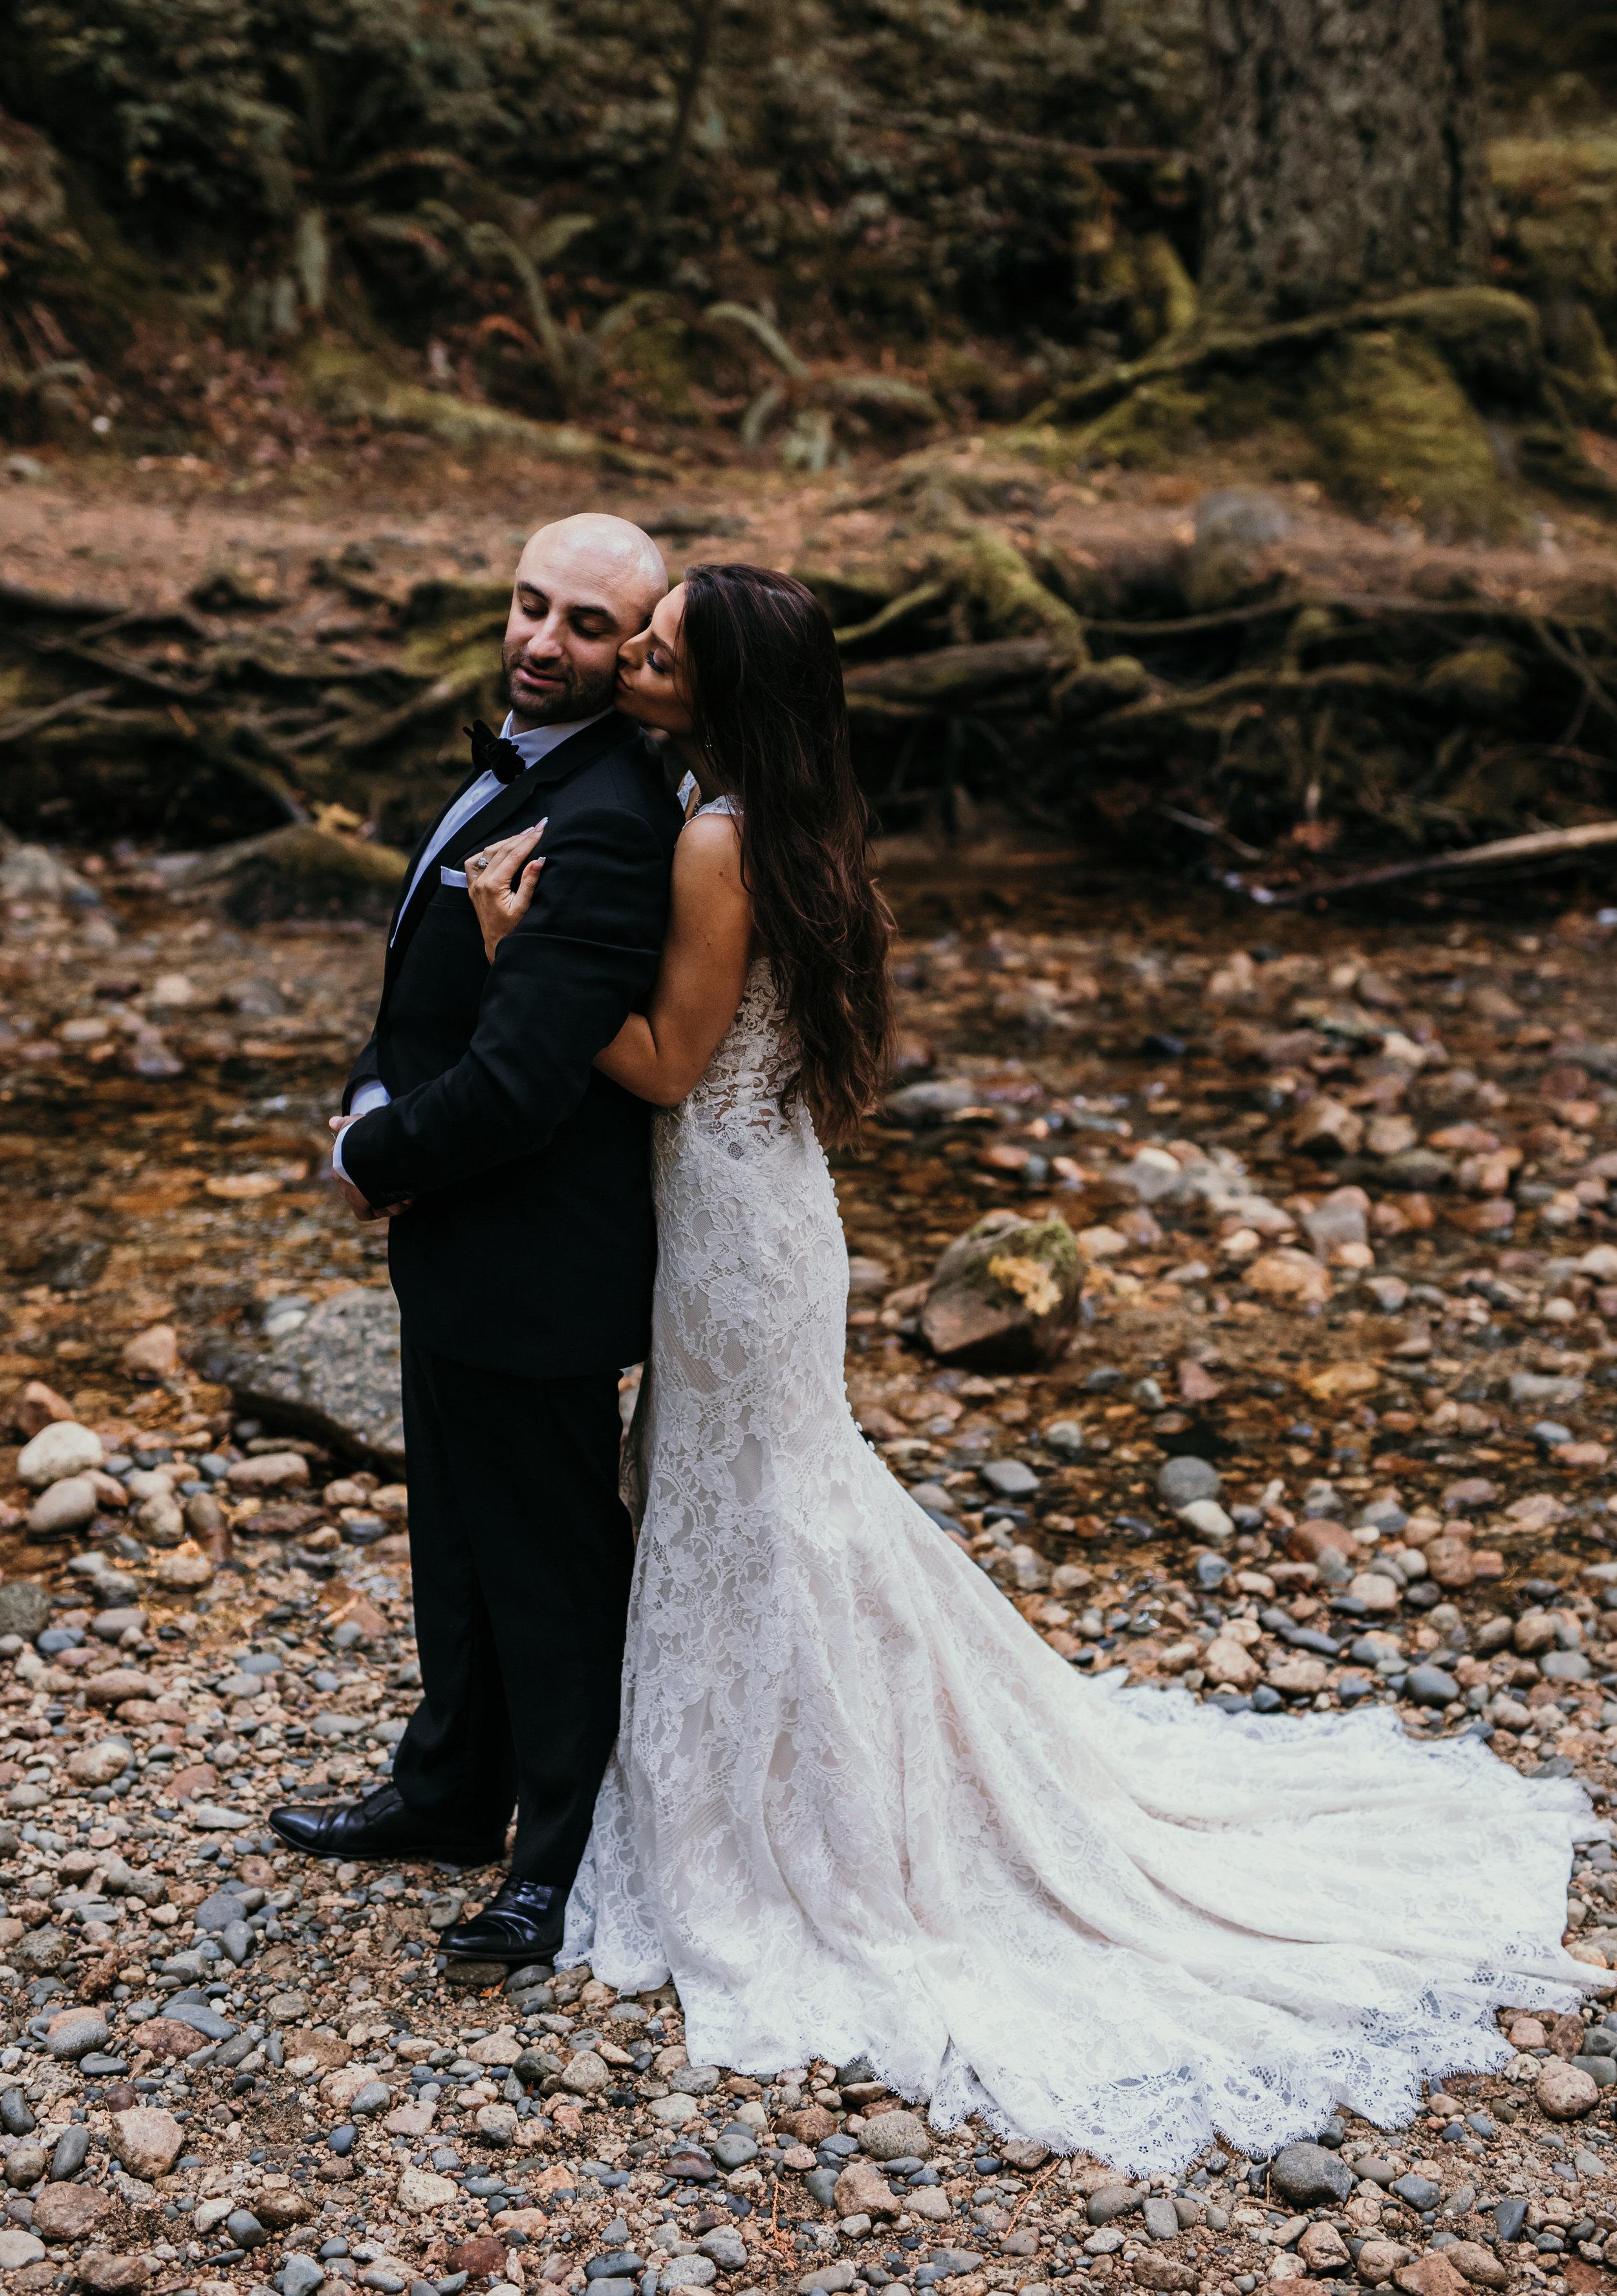 Day After Wedding Photos - Sunshine Coast Wedding Photos - Sunset Wedding Photos - Vancouver Wedding Photographer & Videographer - Sunshine Coast Wedding Photos - Sunshine Coast Wedding Photographer - Jennifer Picard Photography - 1A5A7774.jpg